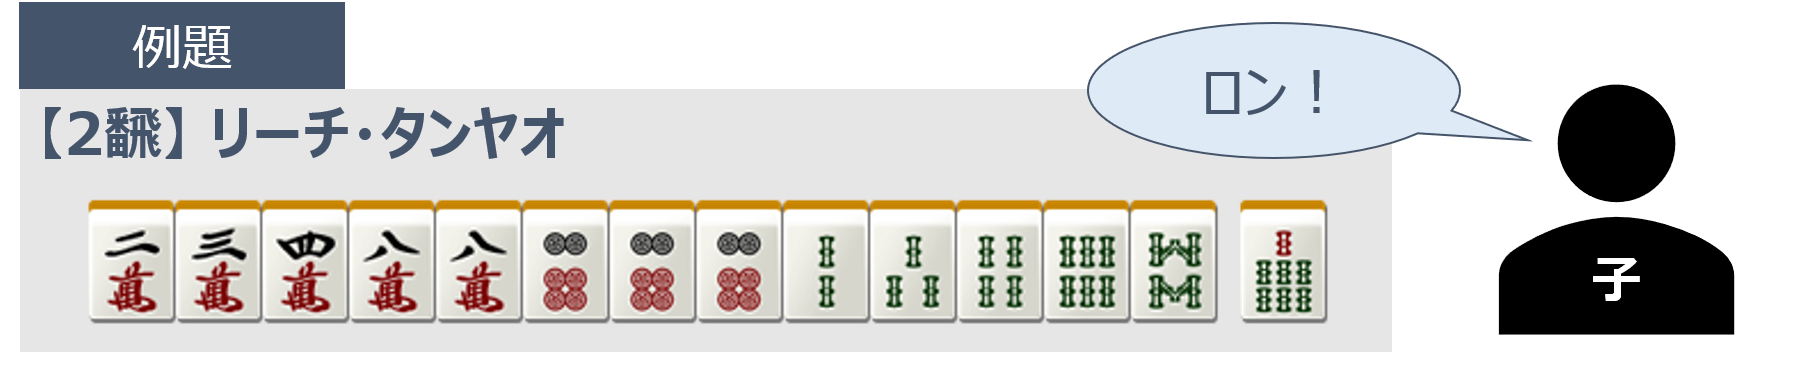 符計算の例題